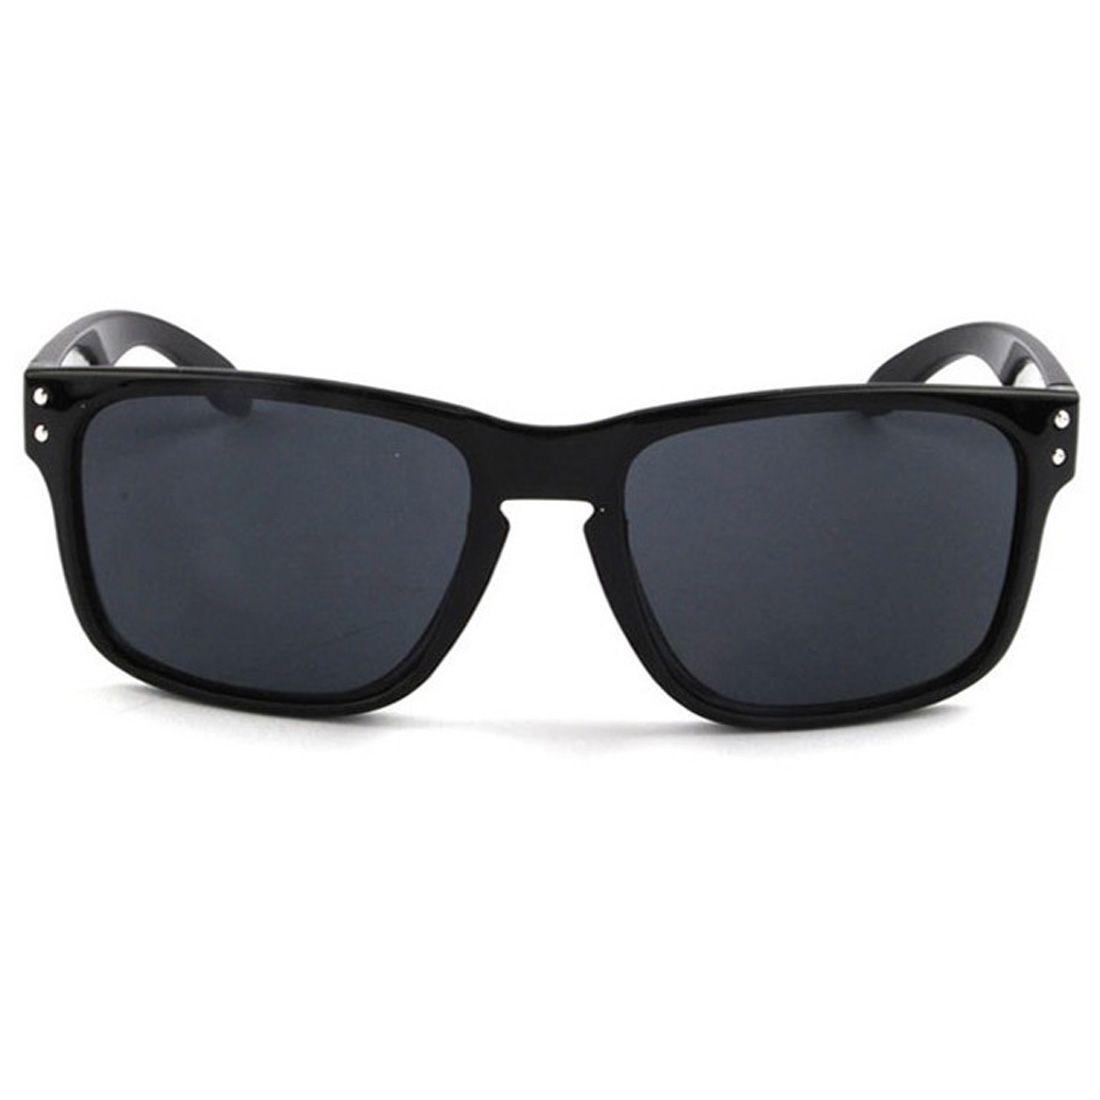 63351314d88 Classic Style Men Women Sunglasses Uv400 Protective Goggles Glasses ...